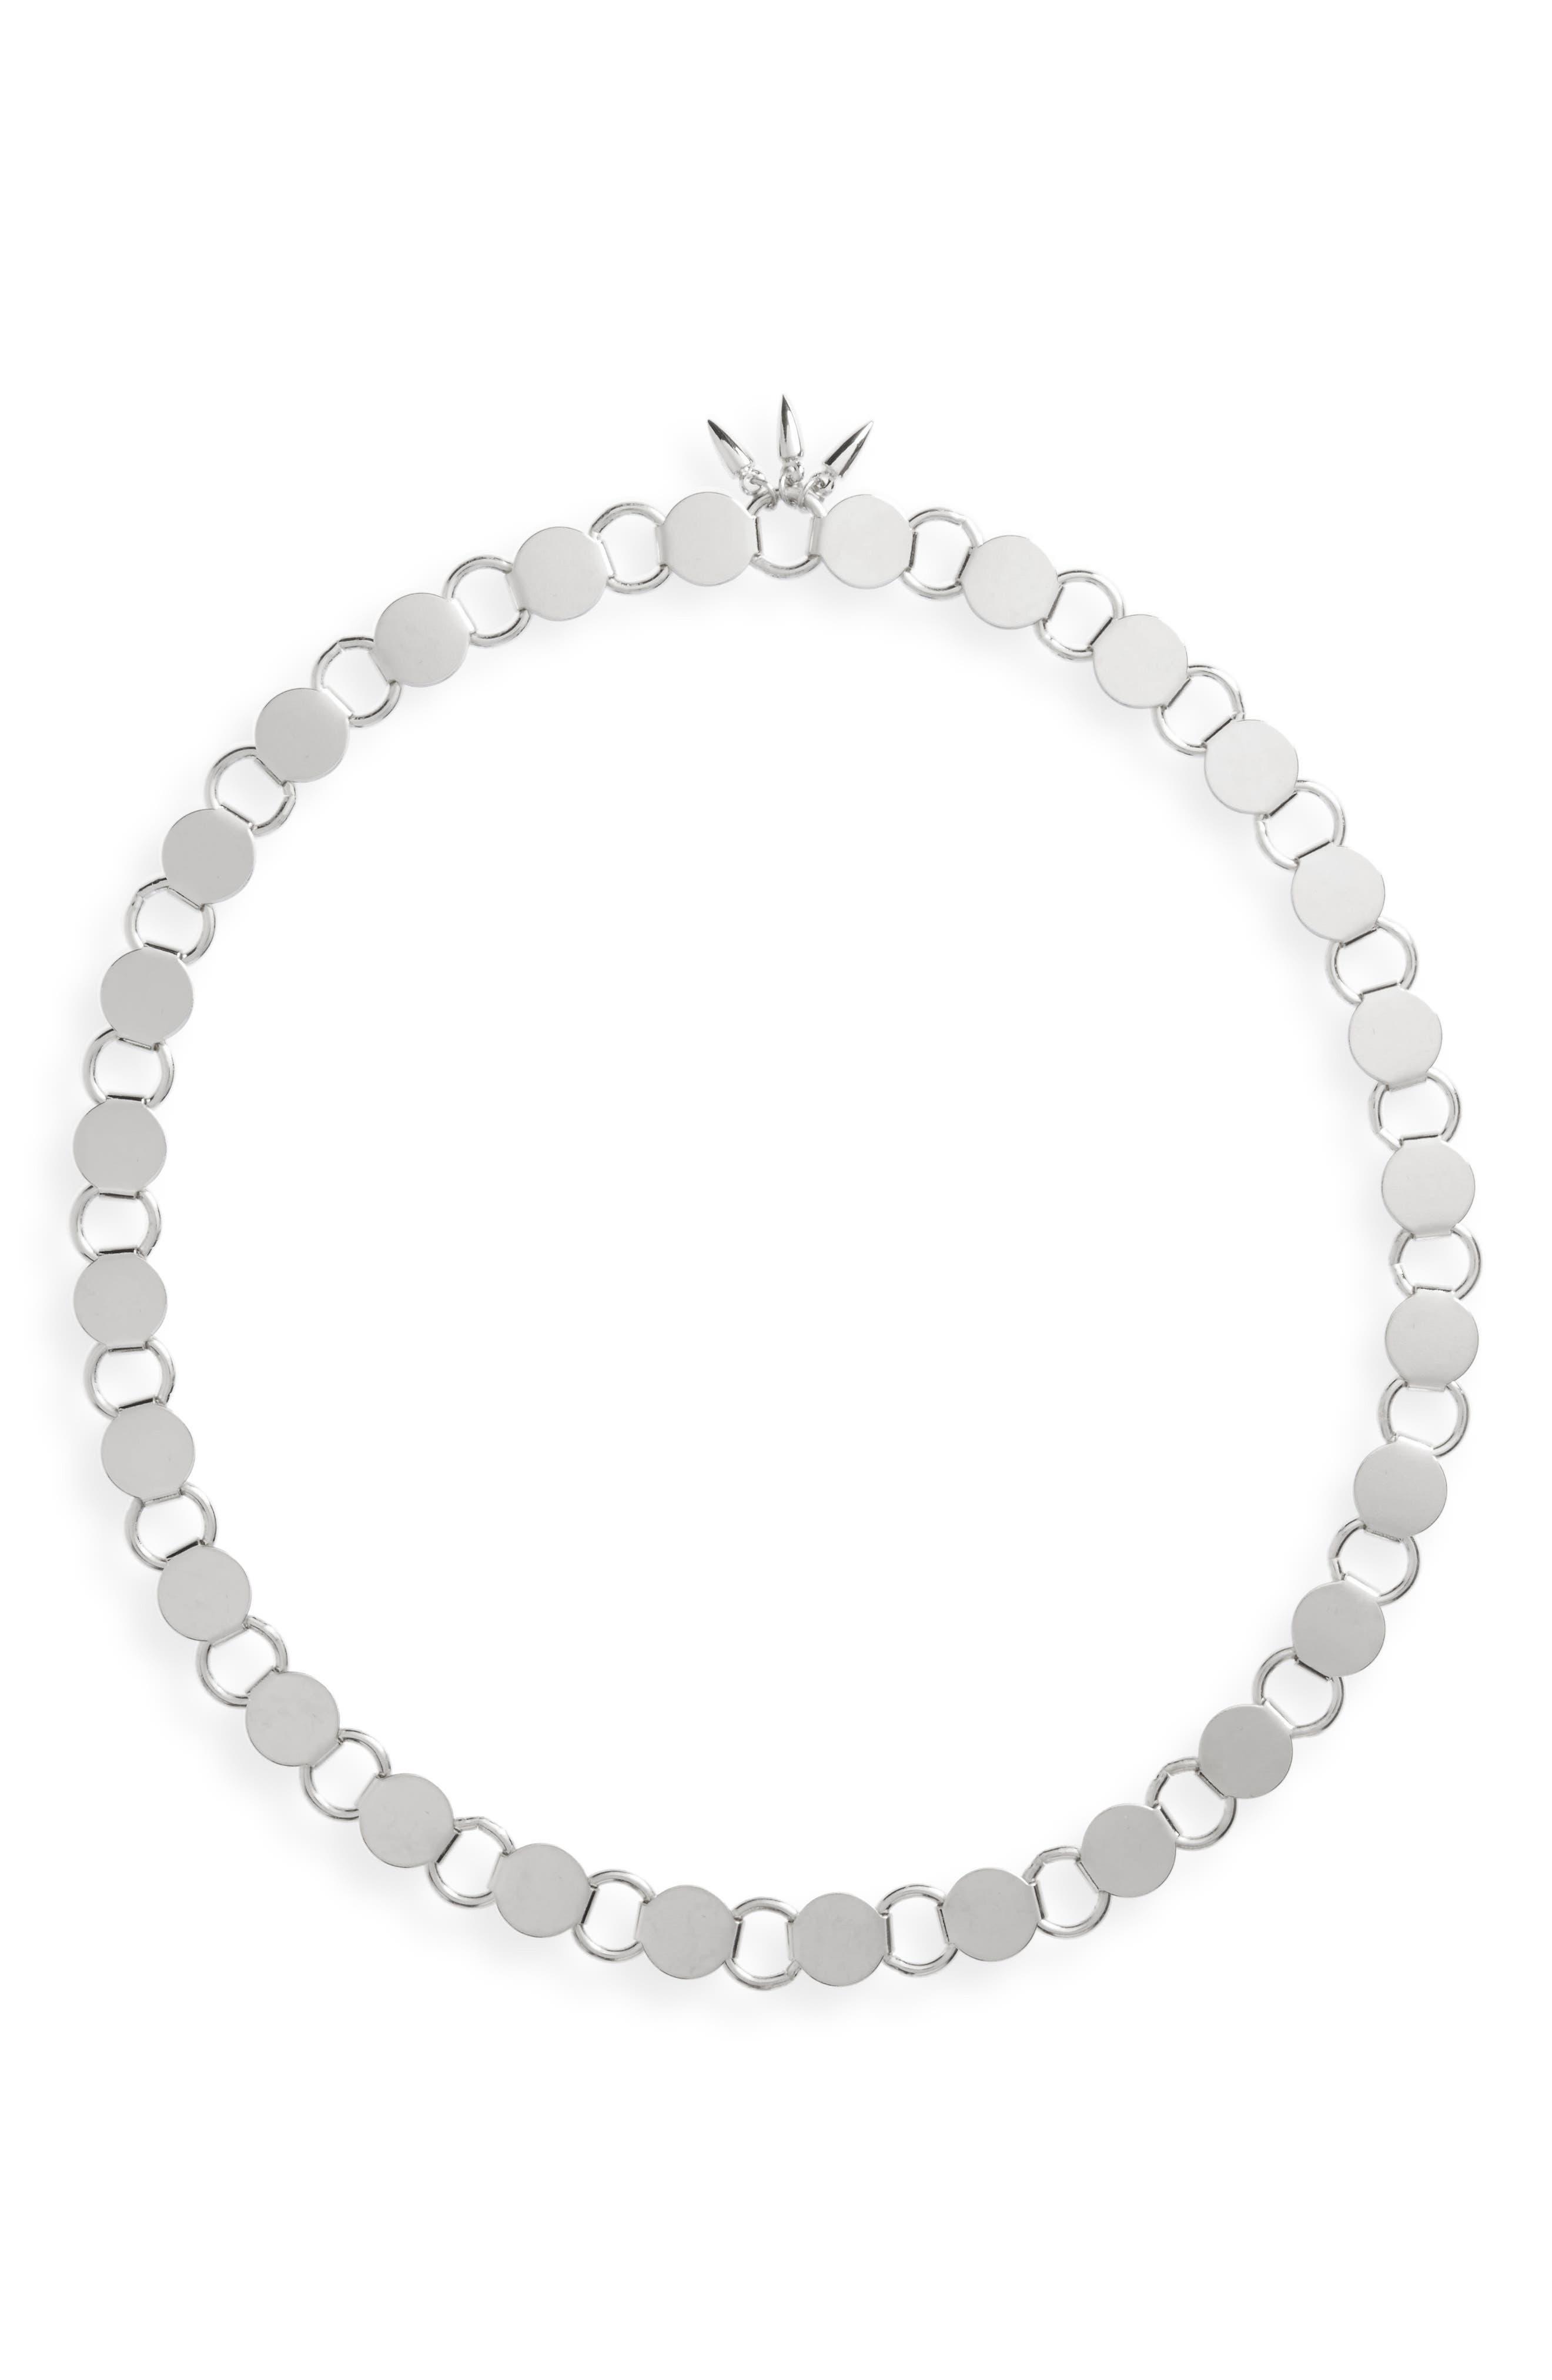 Main Image - BIKO Convertible Link Necklace